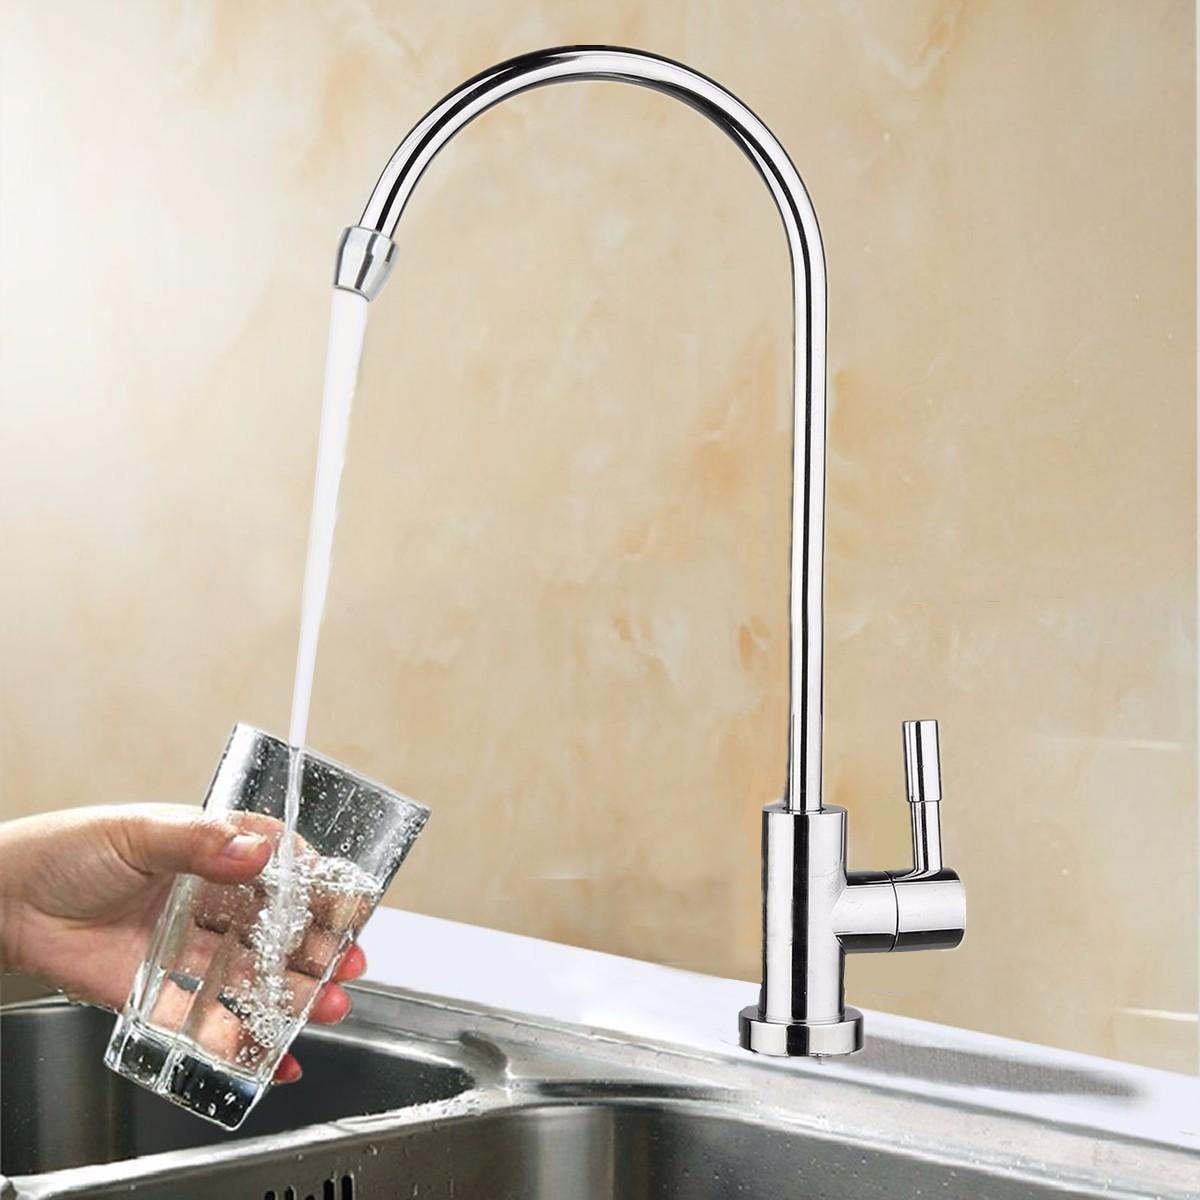 1Pcs Durable Kitchen Bathroom Water Filter Faucet 1/4